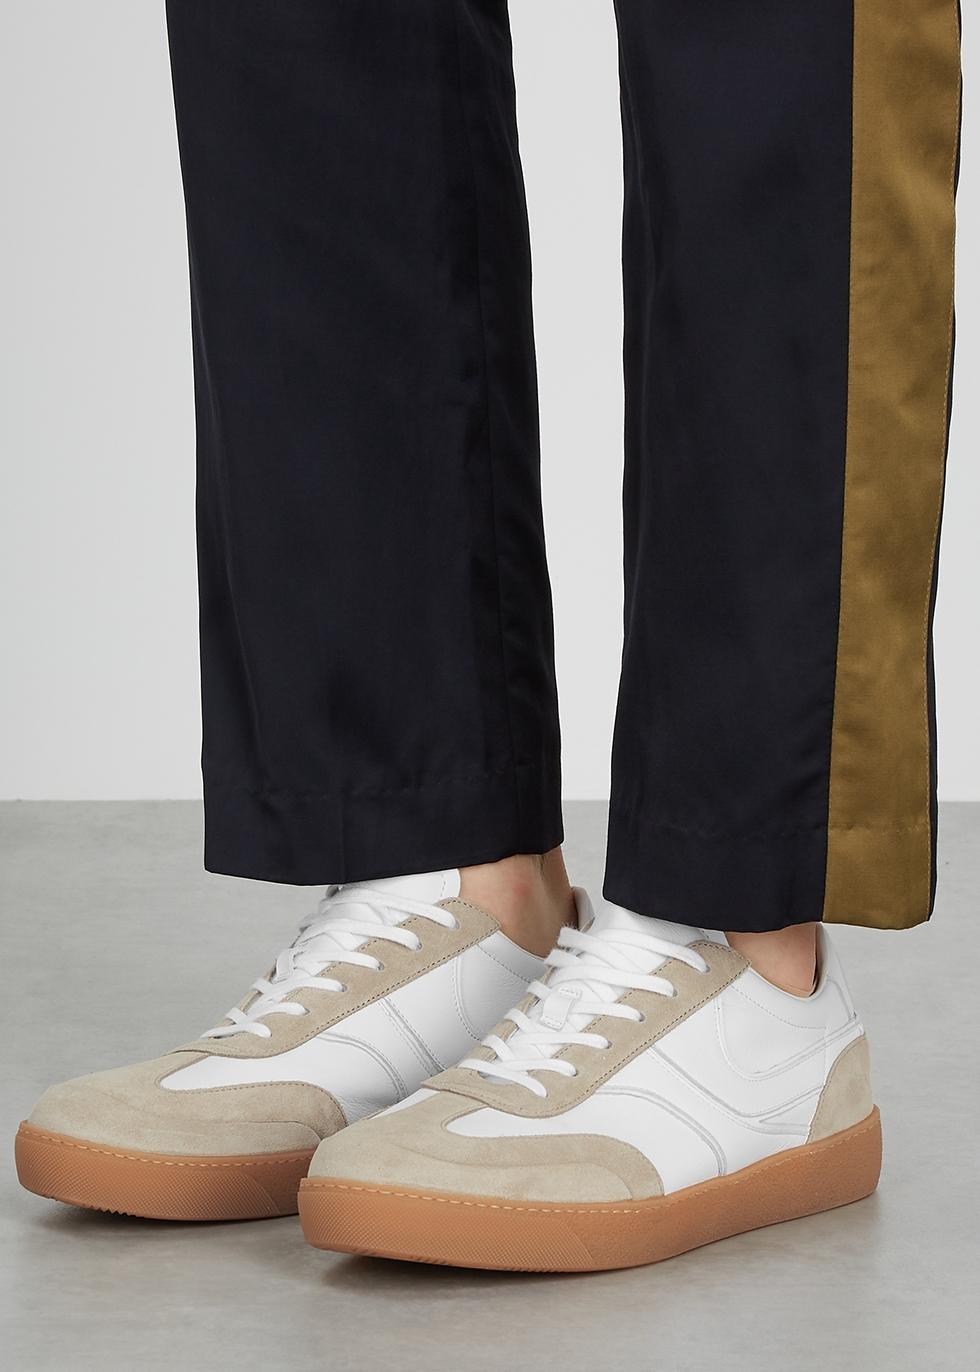 Dries Van Noten White panelled leather